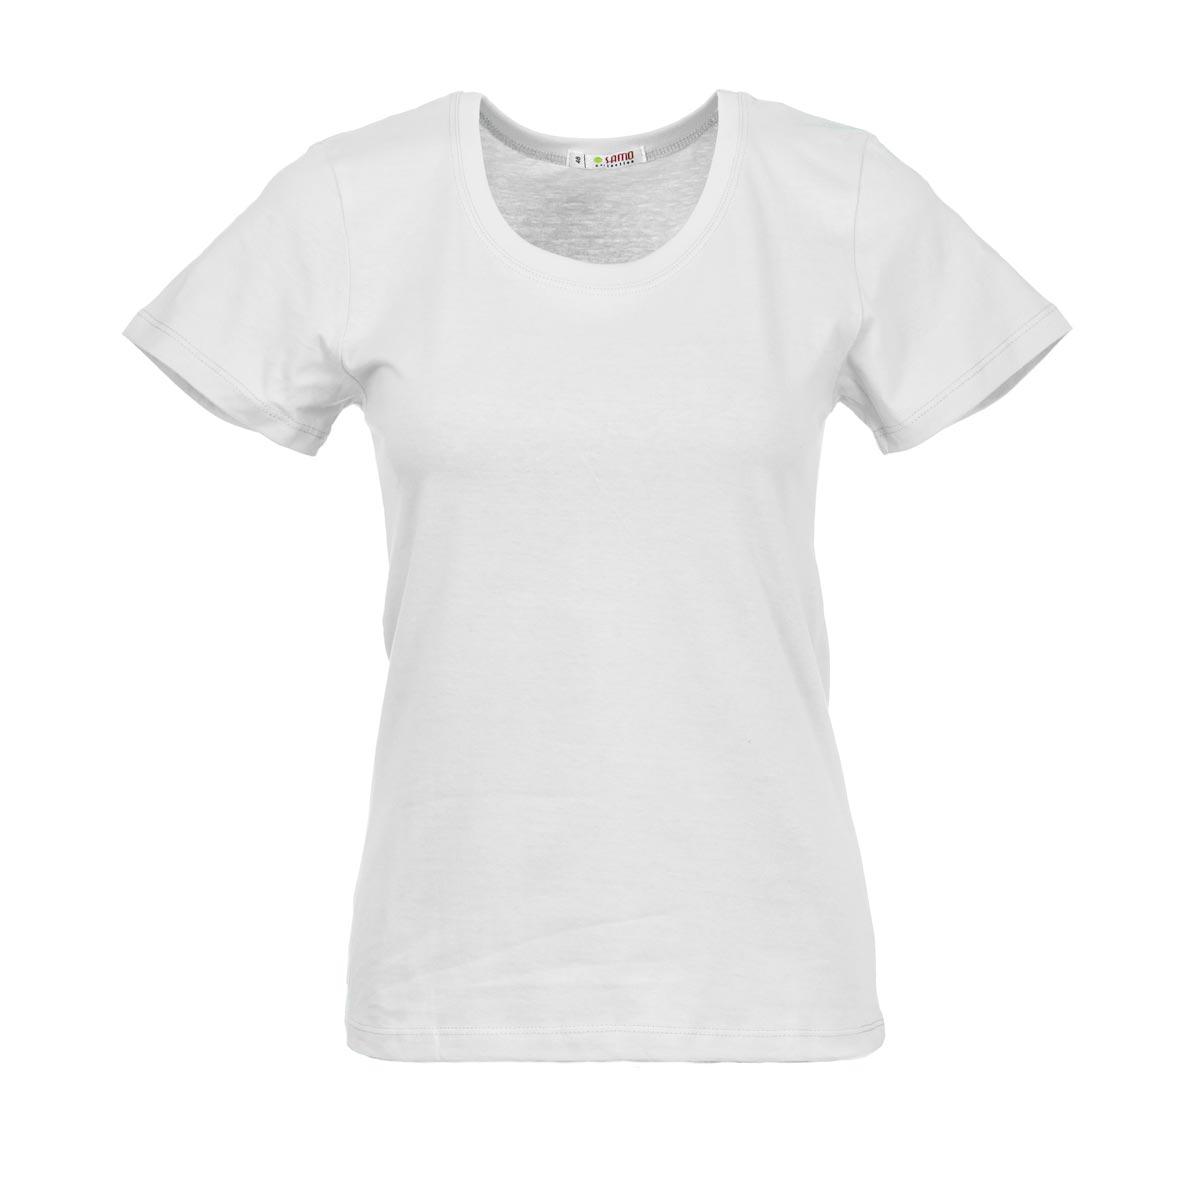 Жен. футболка арт. 04-0045 Белый р. 50Майки и футболки<br>Фактический ОГ: 84 см <br>Фактический ОТ: 82 см <br>Фактический ОБ: 94 см <br>Длина по спинке: 59 см <br>Рост: 164-170 см<br><br>Тип: Жен. футболка<br>Размер: 50<br>Материал: Супрем